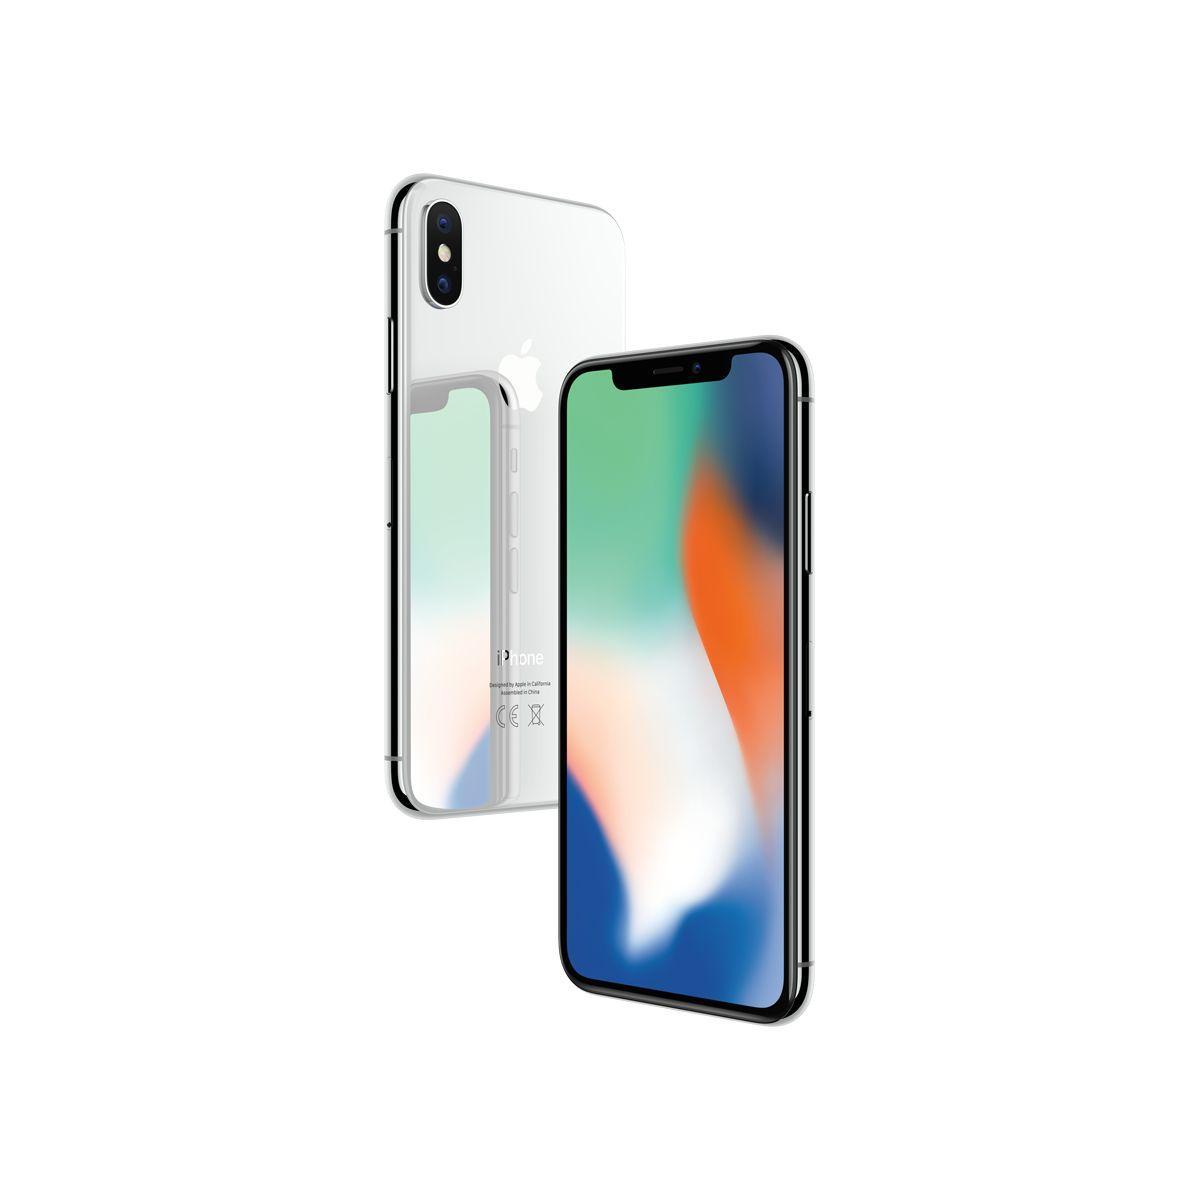 Smartphone apple iphone x argent 64 go